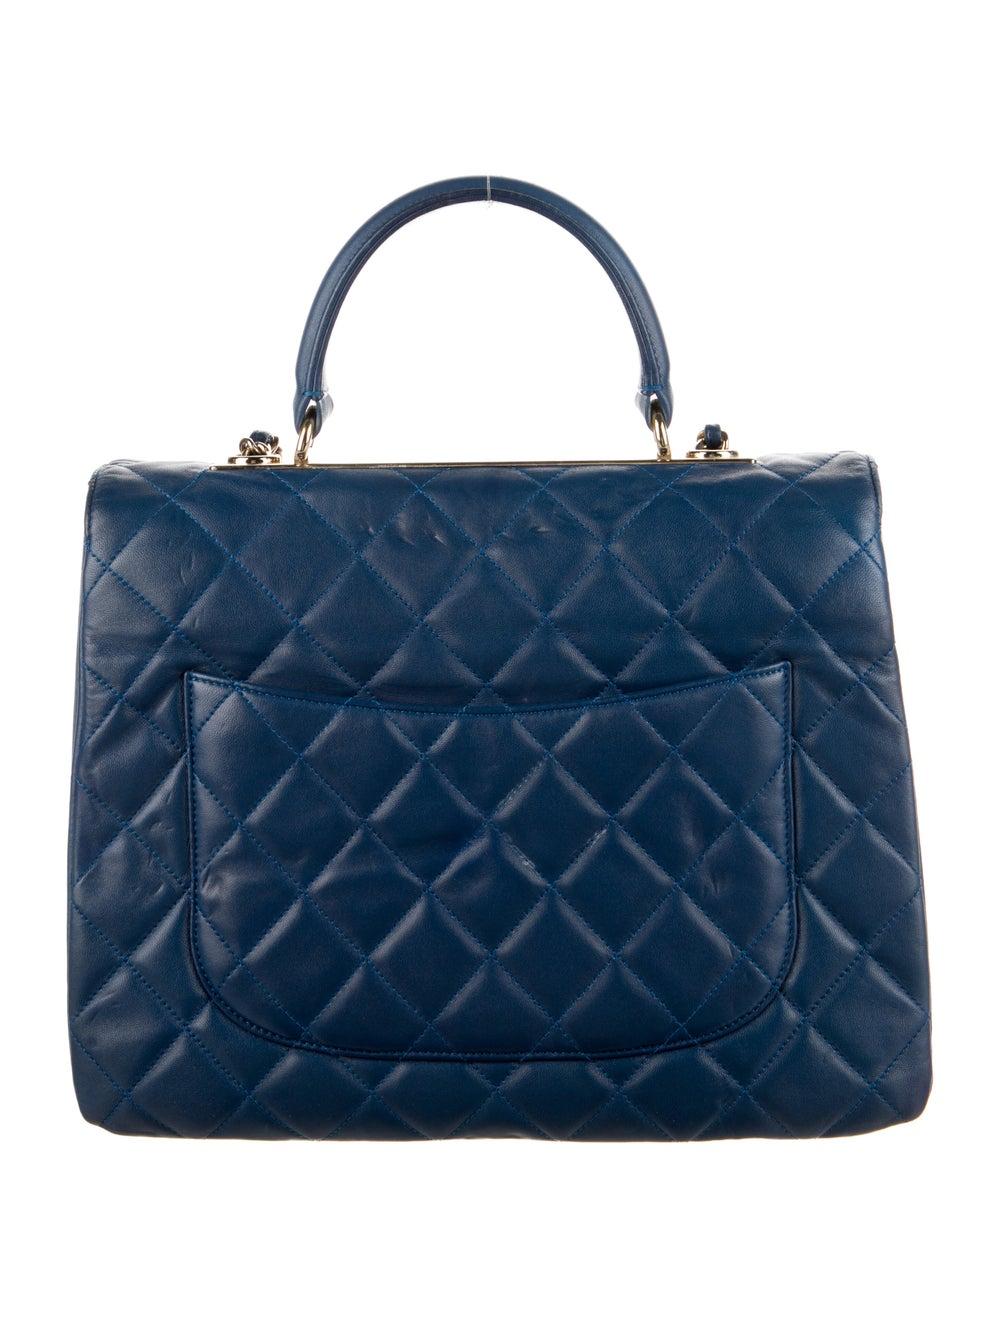 Chanel Large Trendy CC Flap Bag Blue - image 4